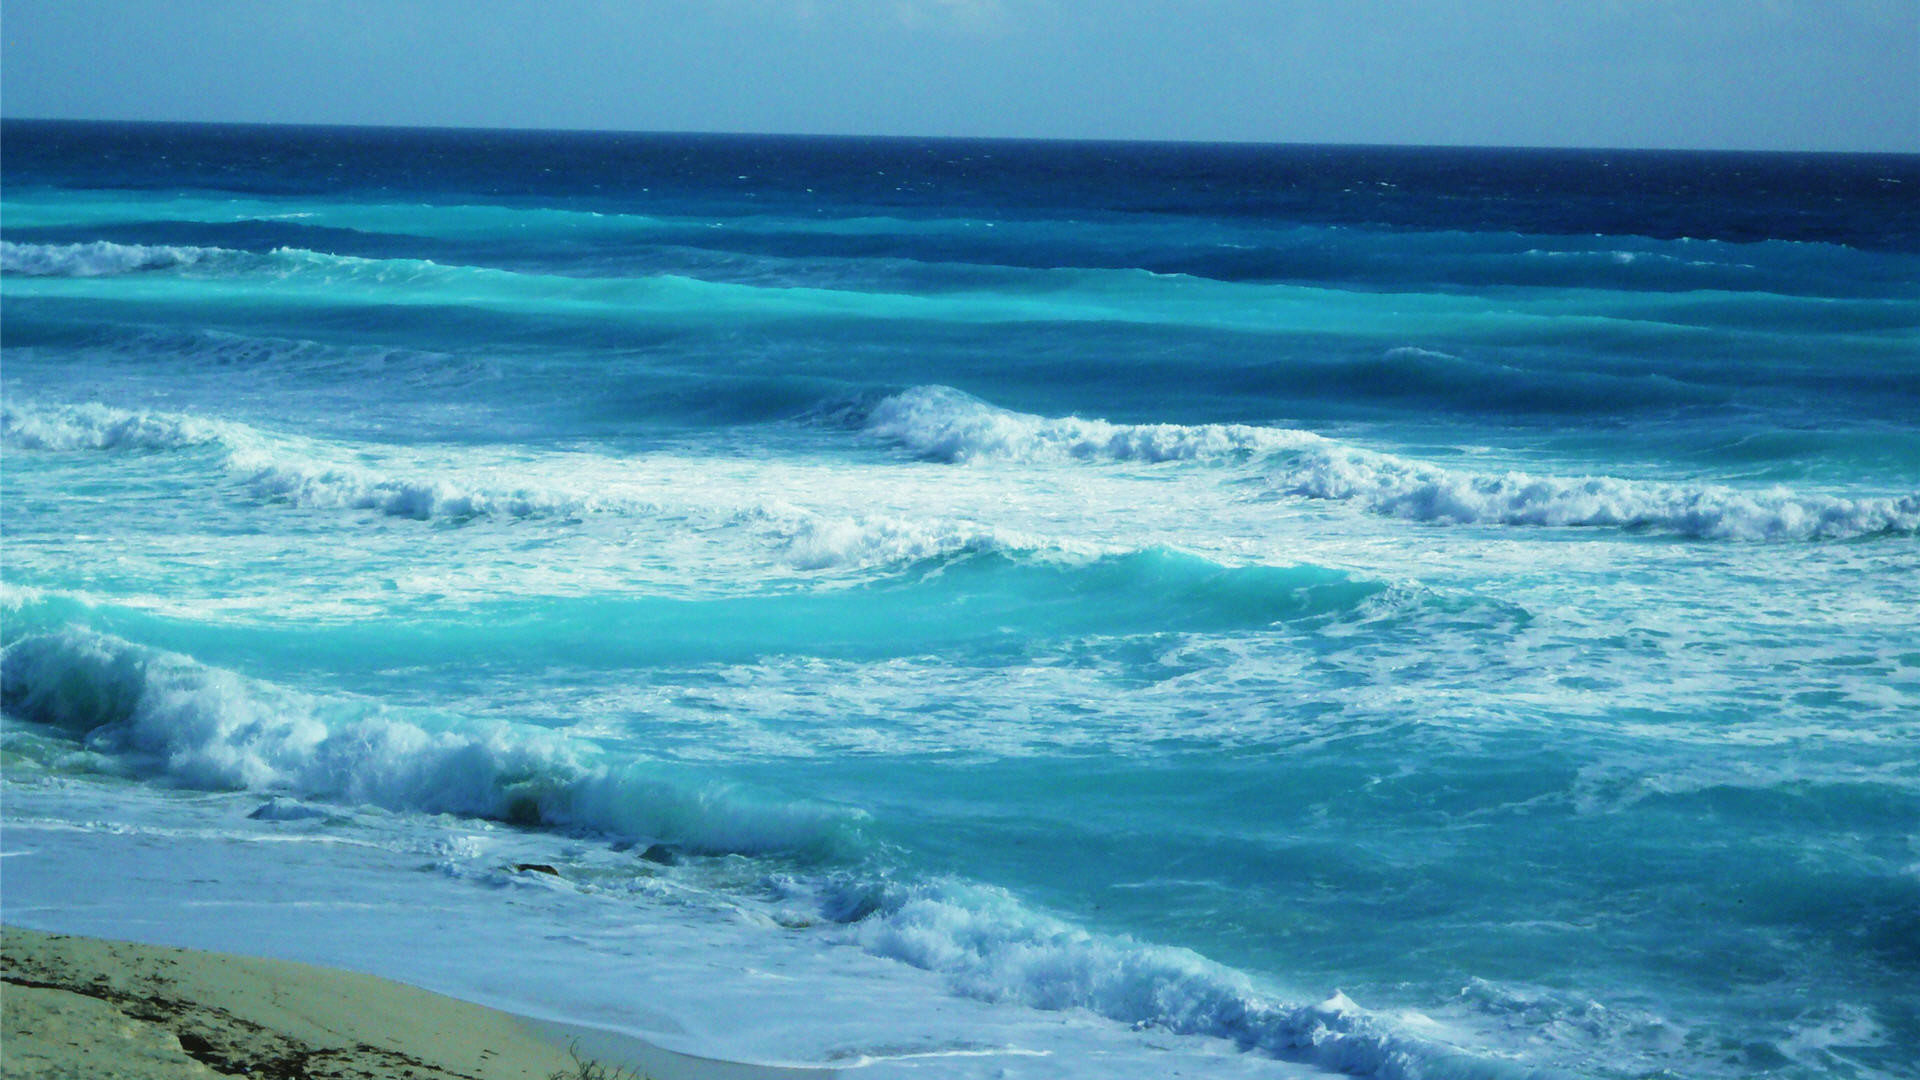 waves crystal ocean wallpaper which is under the ocean wallpapers .